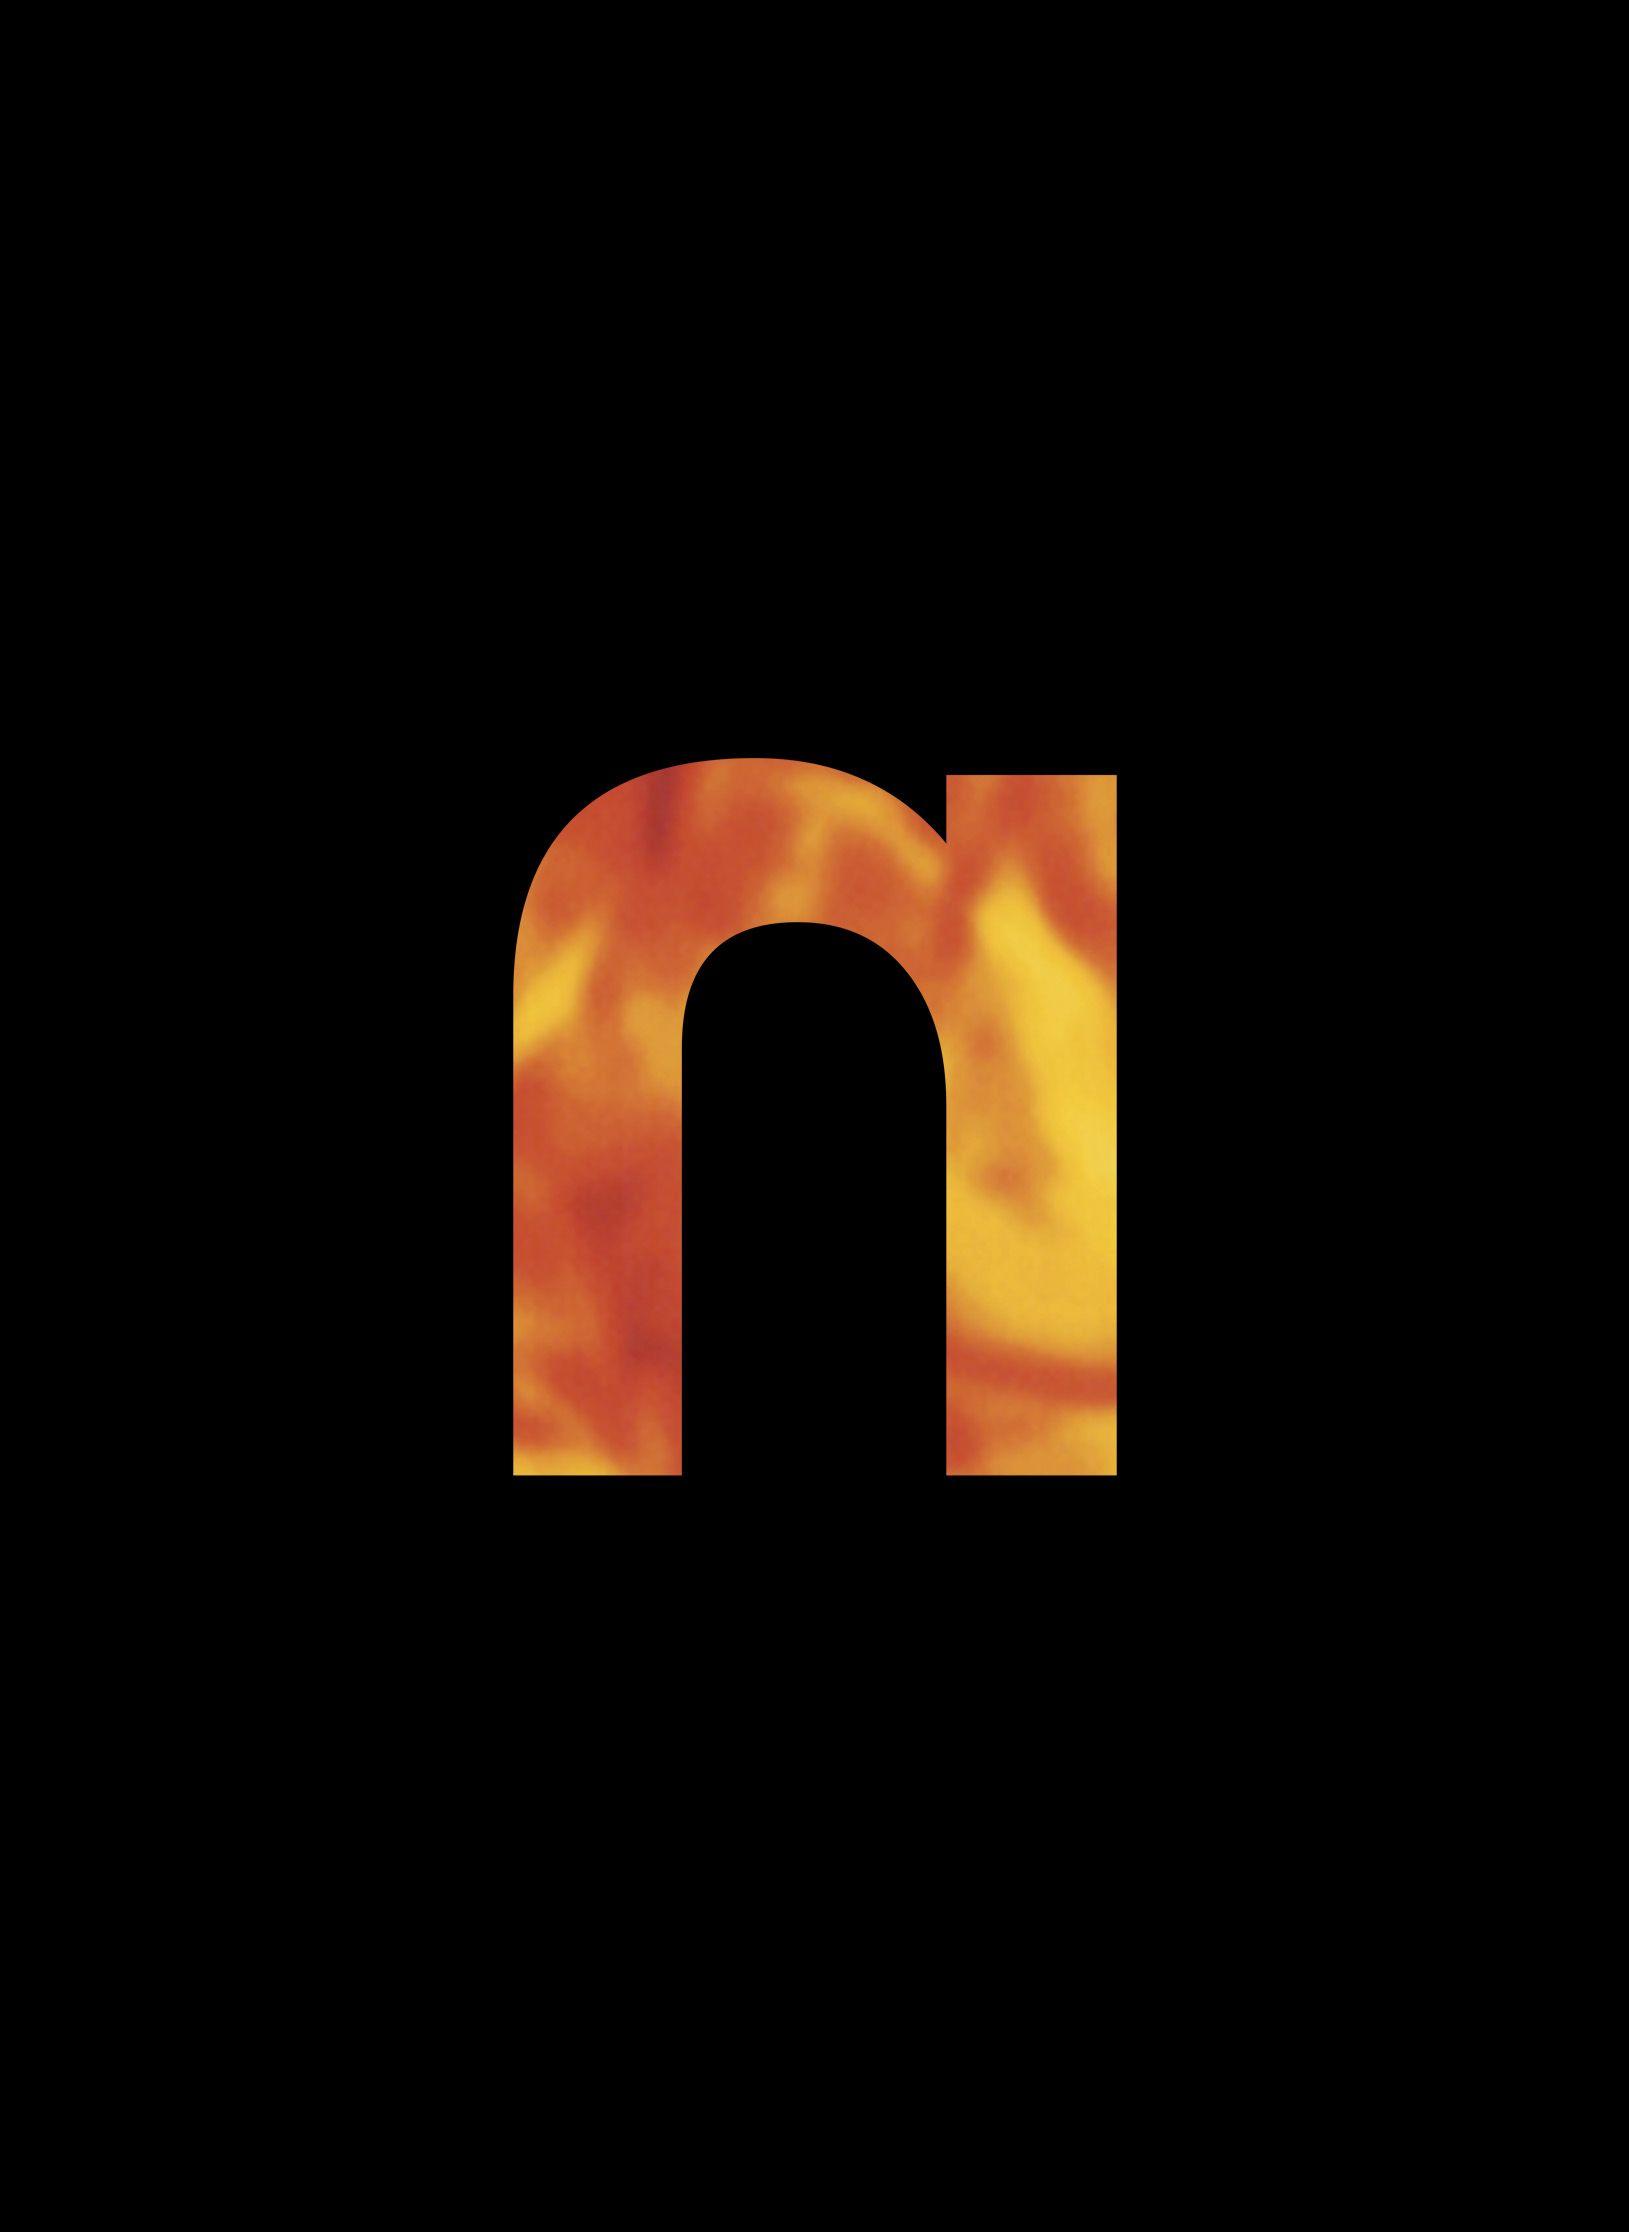 Nine Inch Nails - Broken Movie (1993) | Music Documentary ...